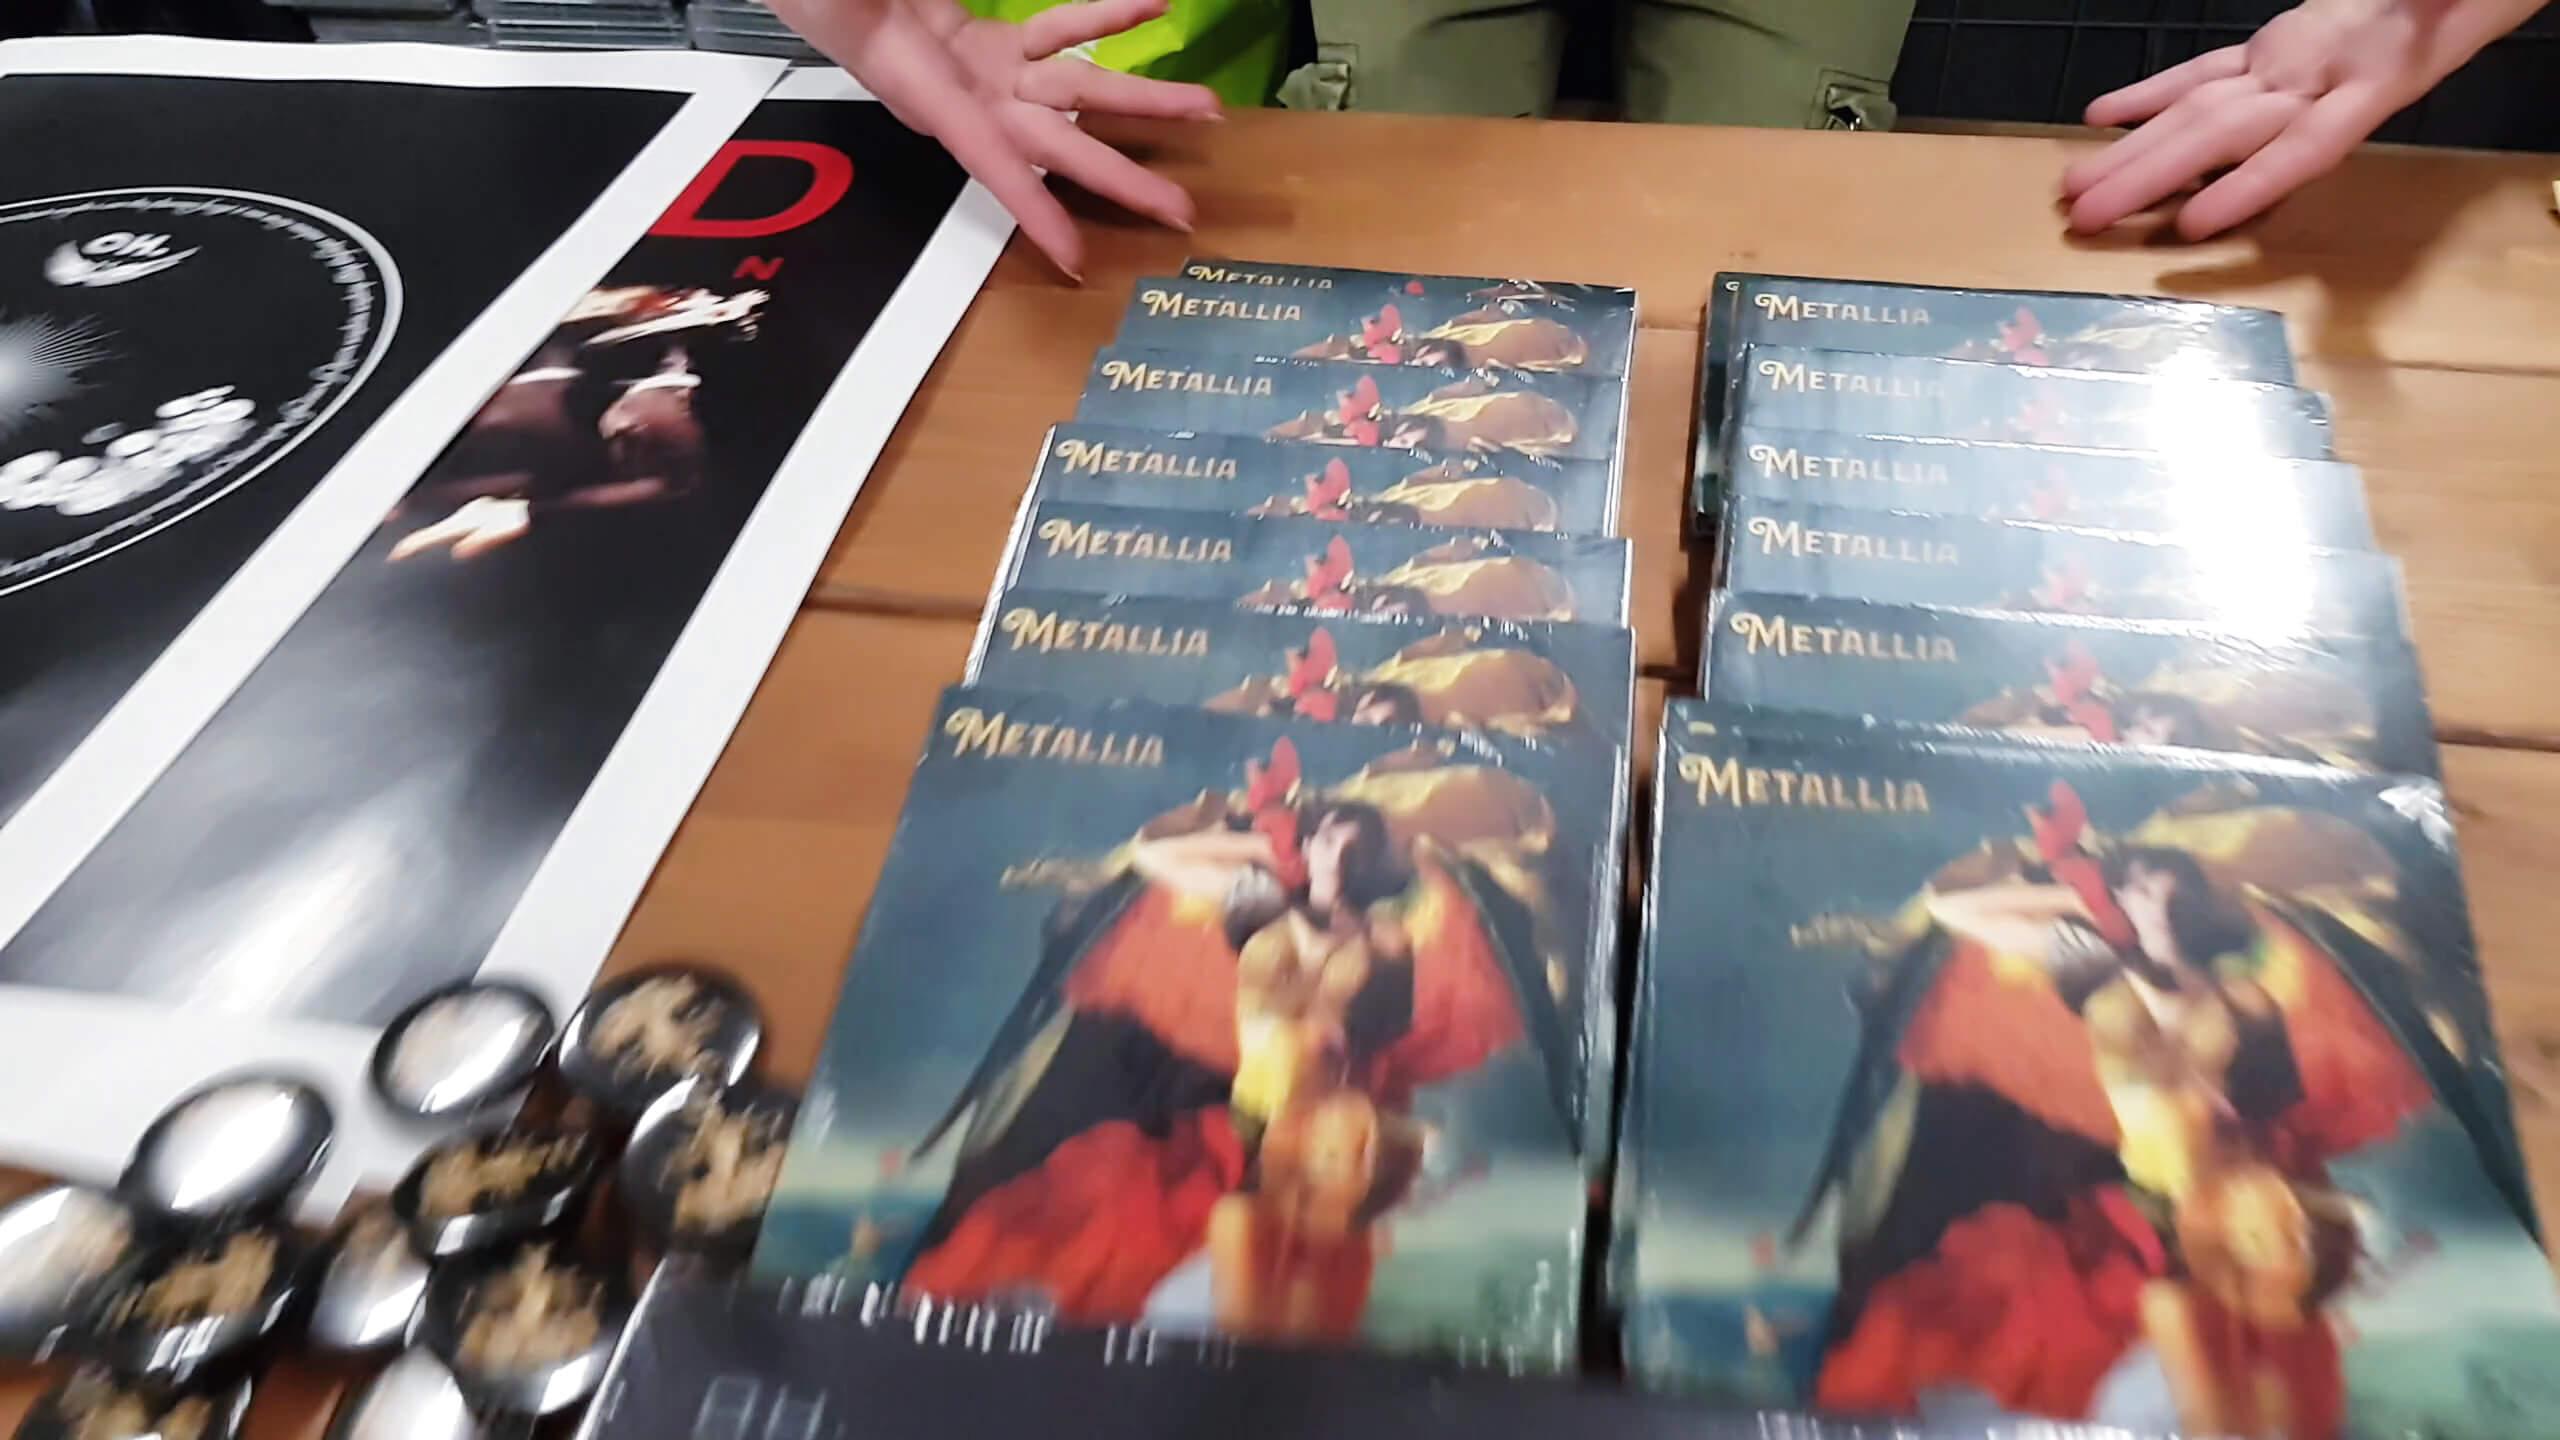 2Days Prog + 1 Festival Nick Katona, Olivia Hadjiioannou, Oh. Metallia Veruno Italy